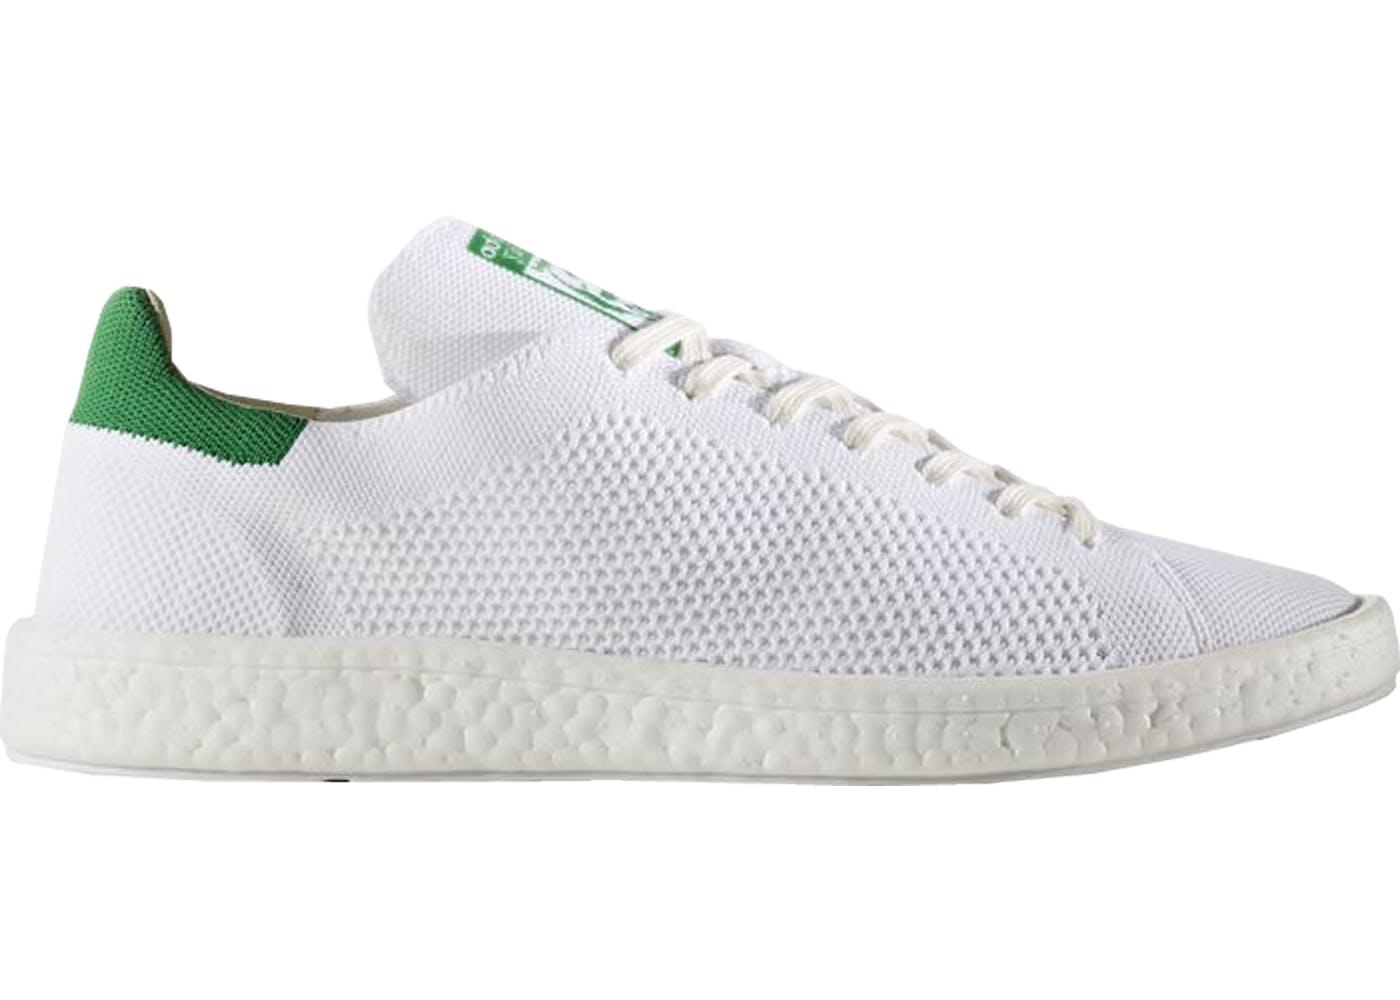 adidas stan smith boost primeknit white green. Black Bedroom Furniture Sets. Home Design Ideas